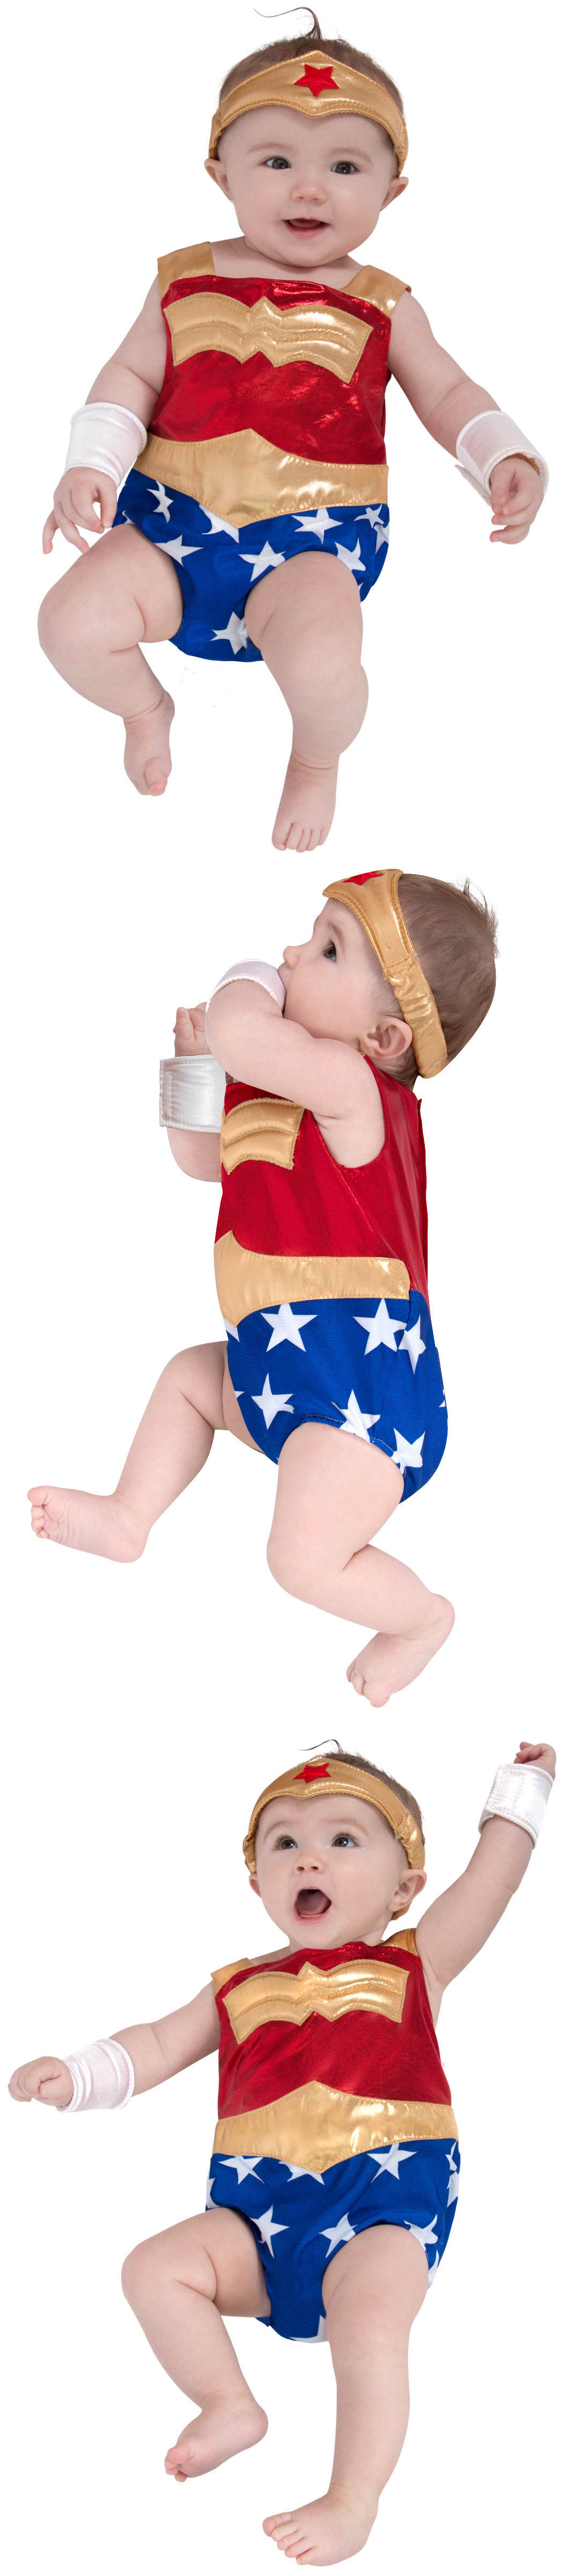 halloween costumes kids: 5135 newborn wonder woman costume dc comics